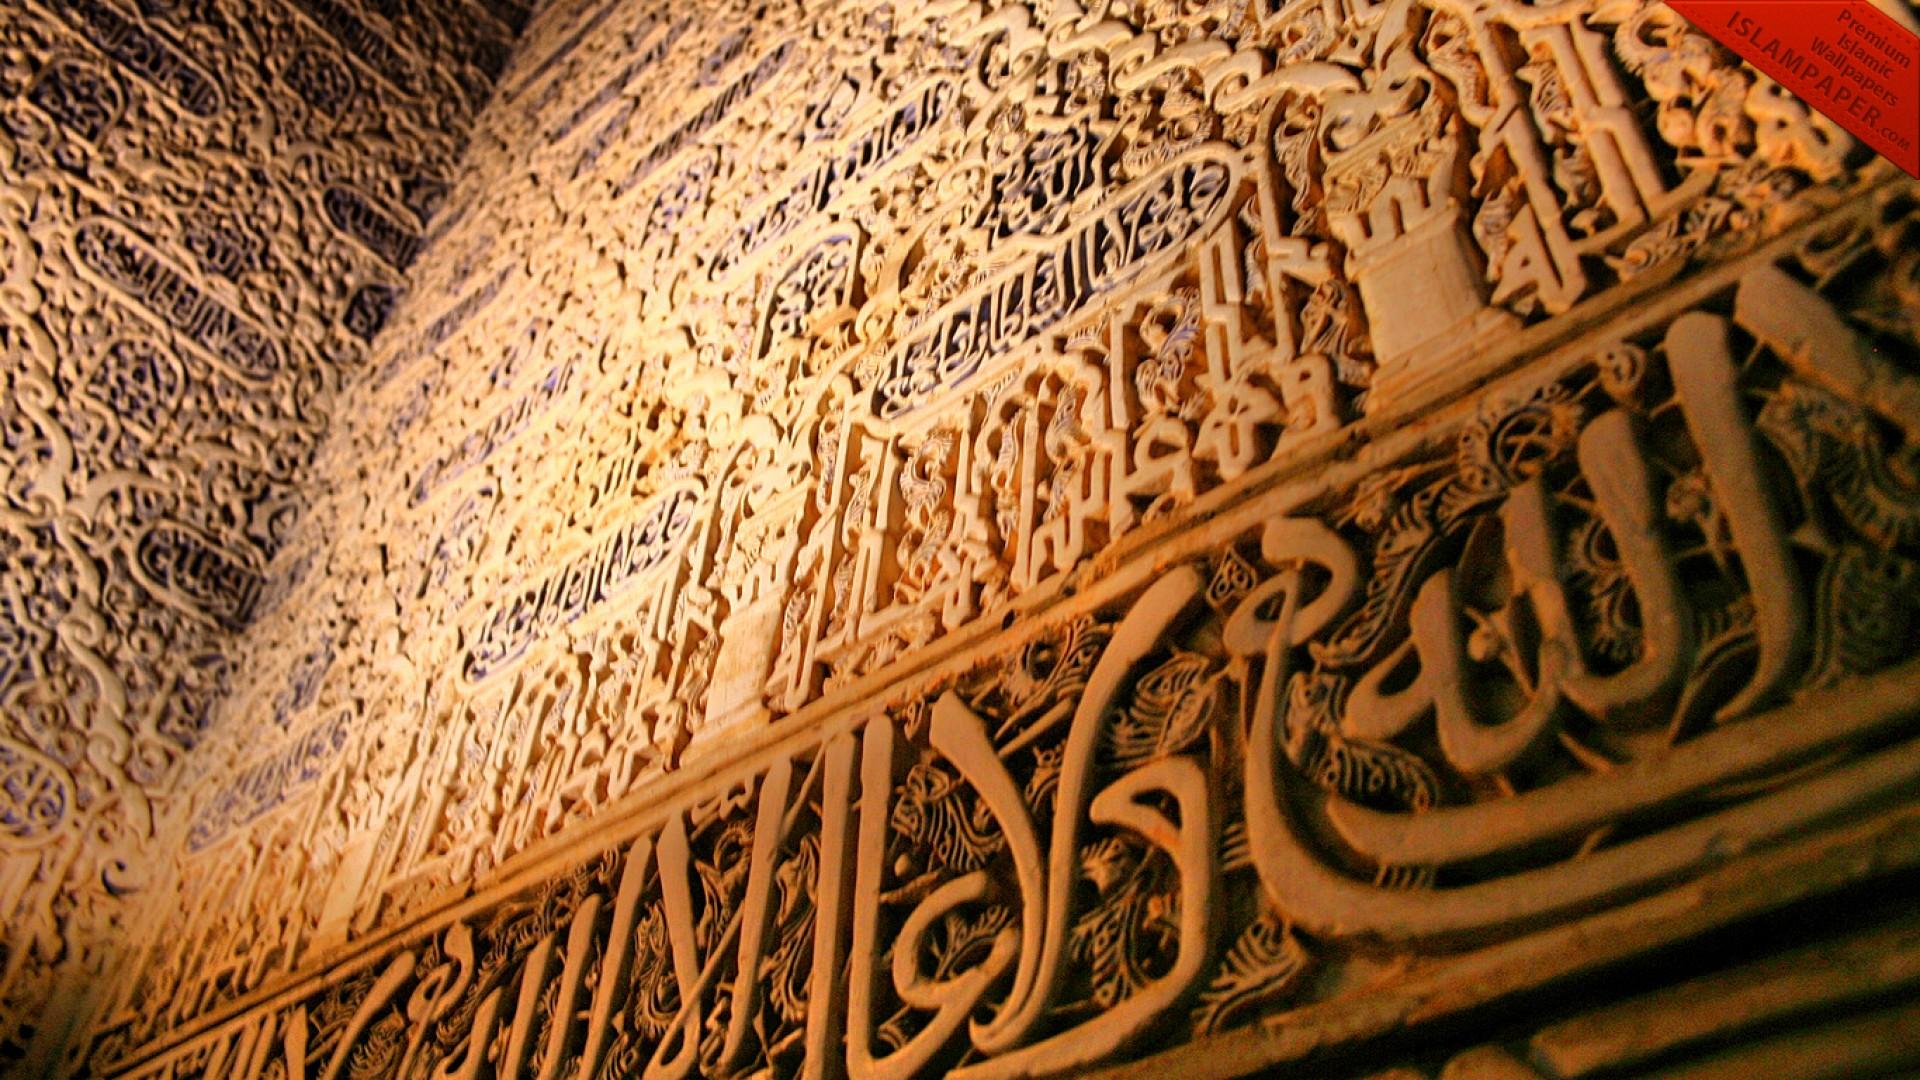 Islamic architecture image mod db - Quran wallpaper gallery ...